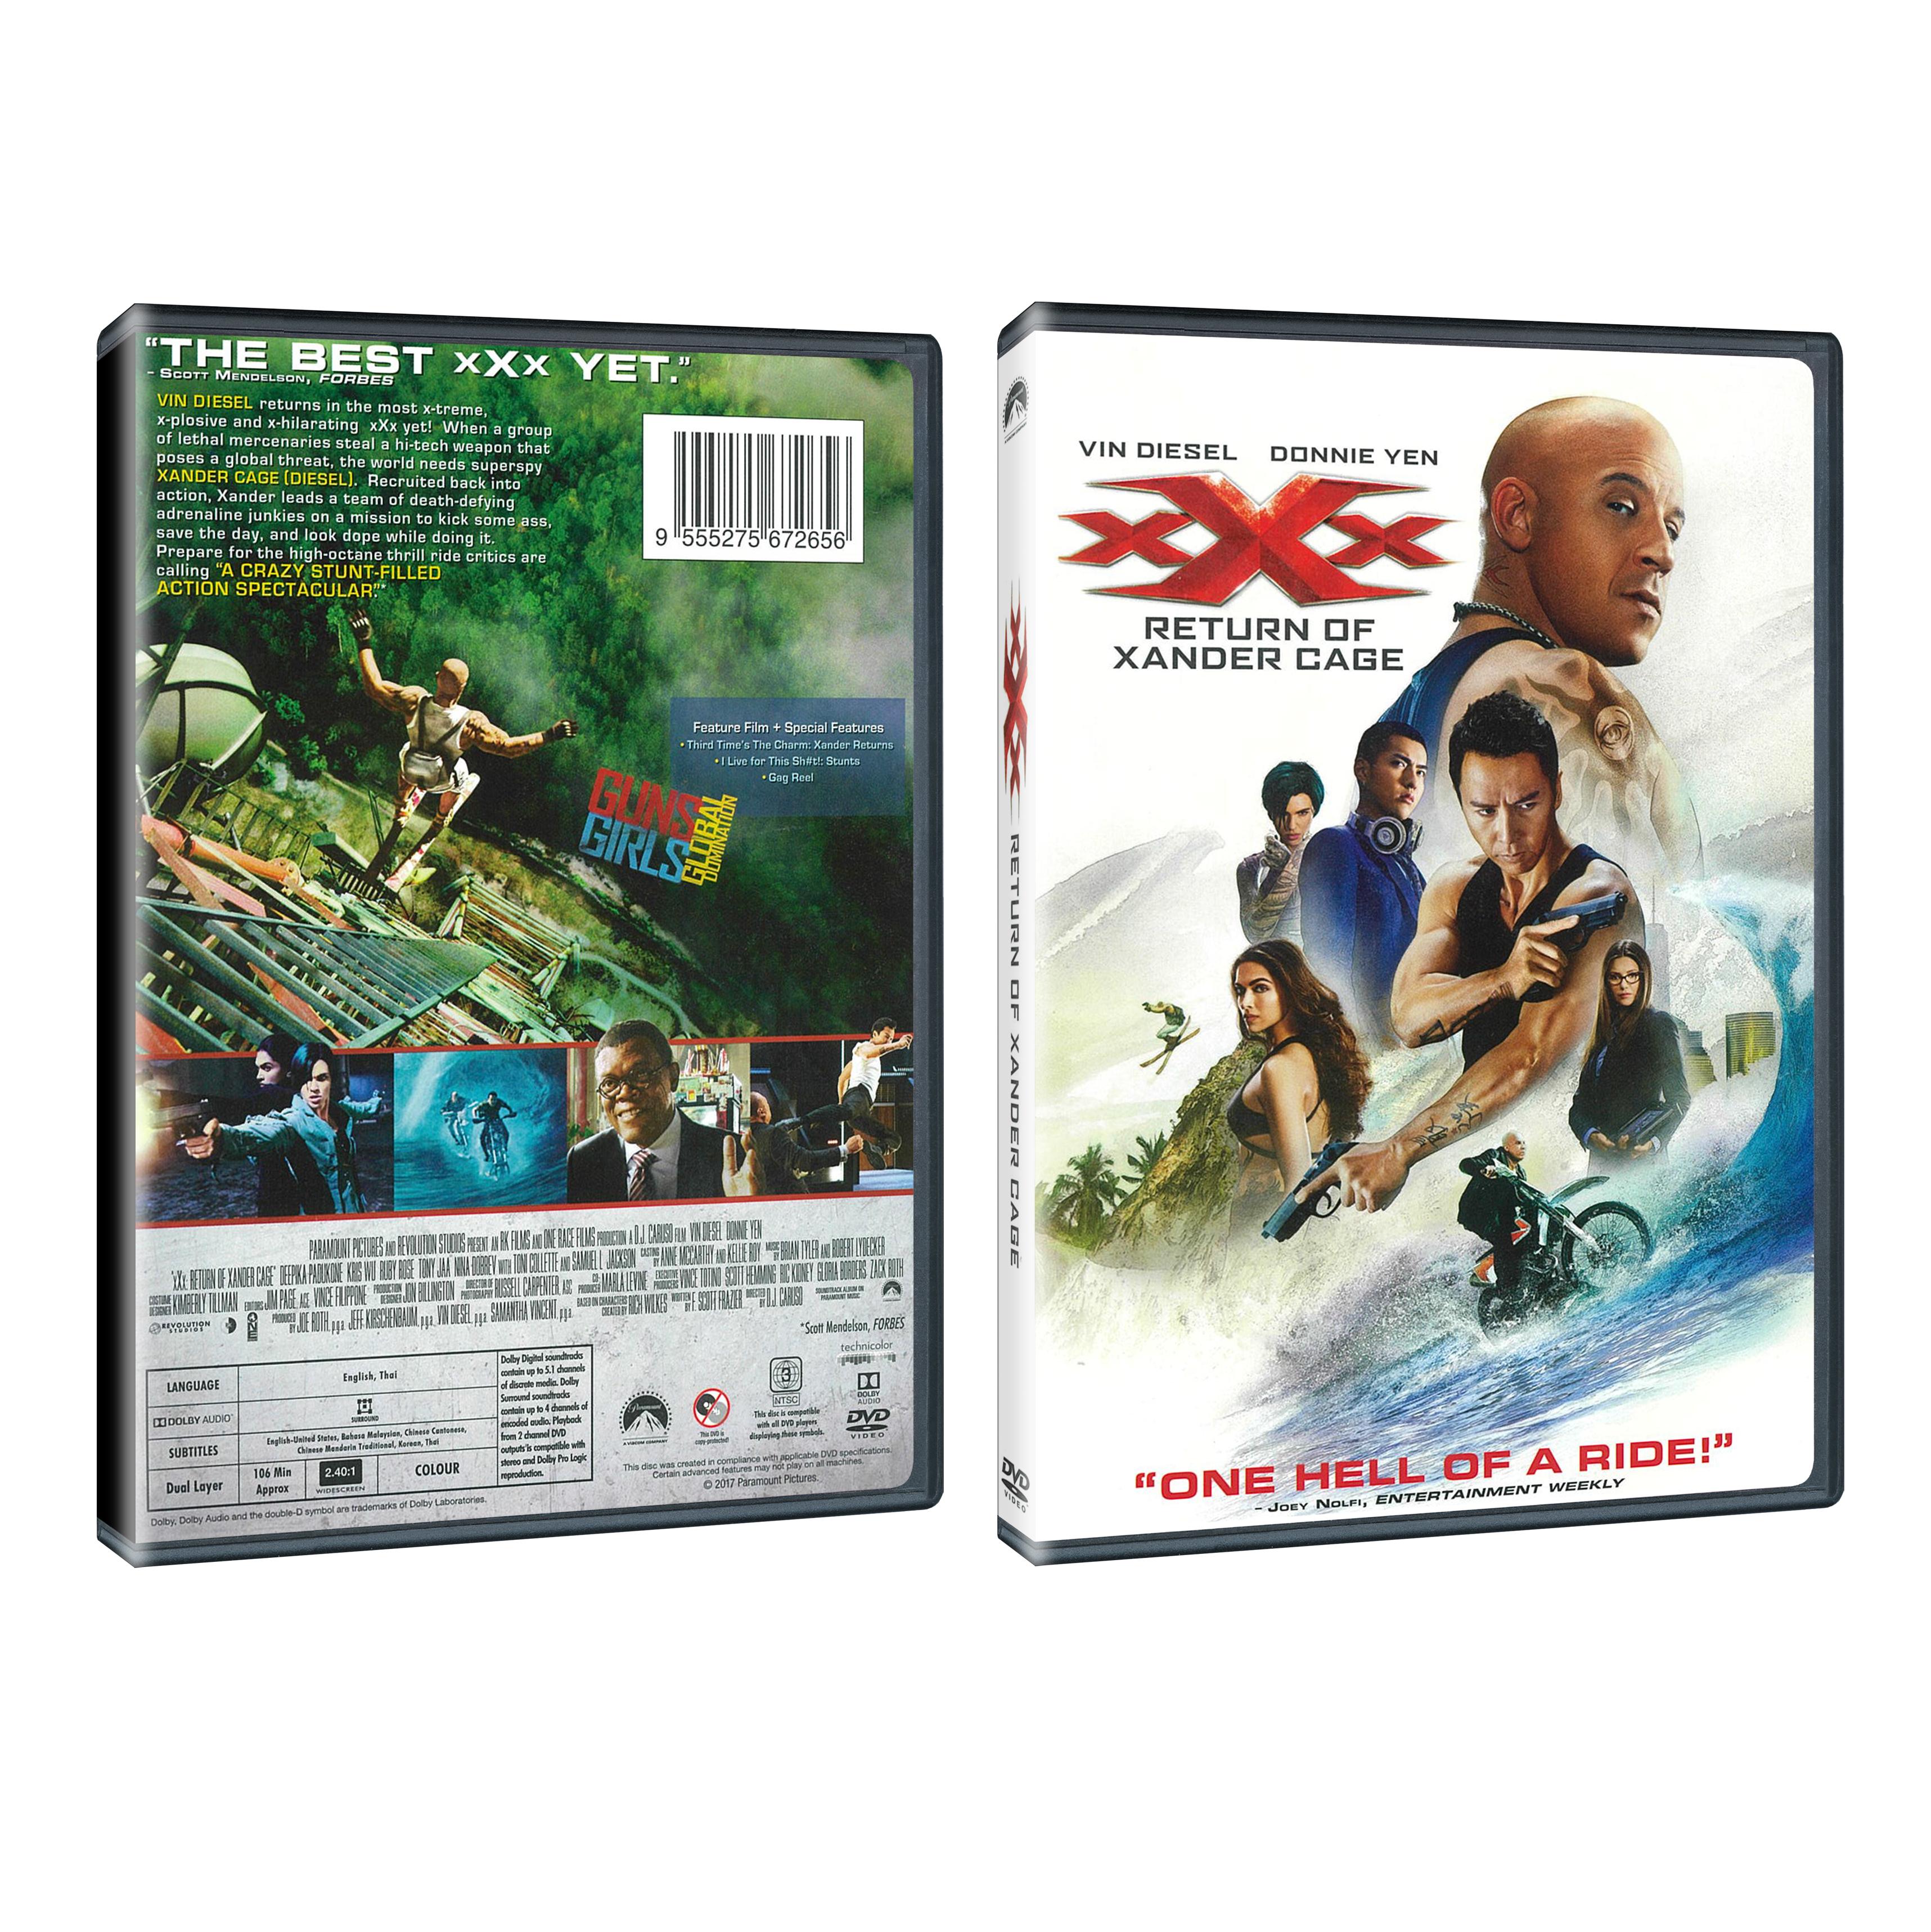 XXx: Return Of Xander Cage (DVD)